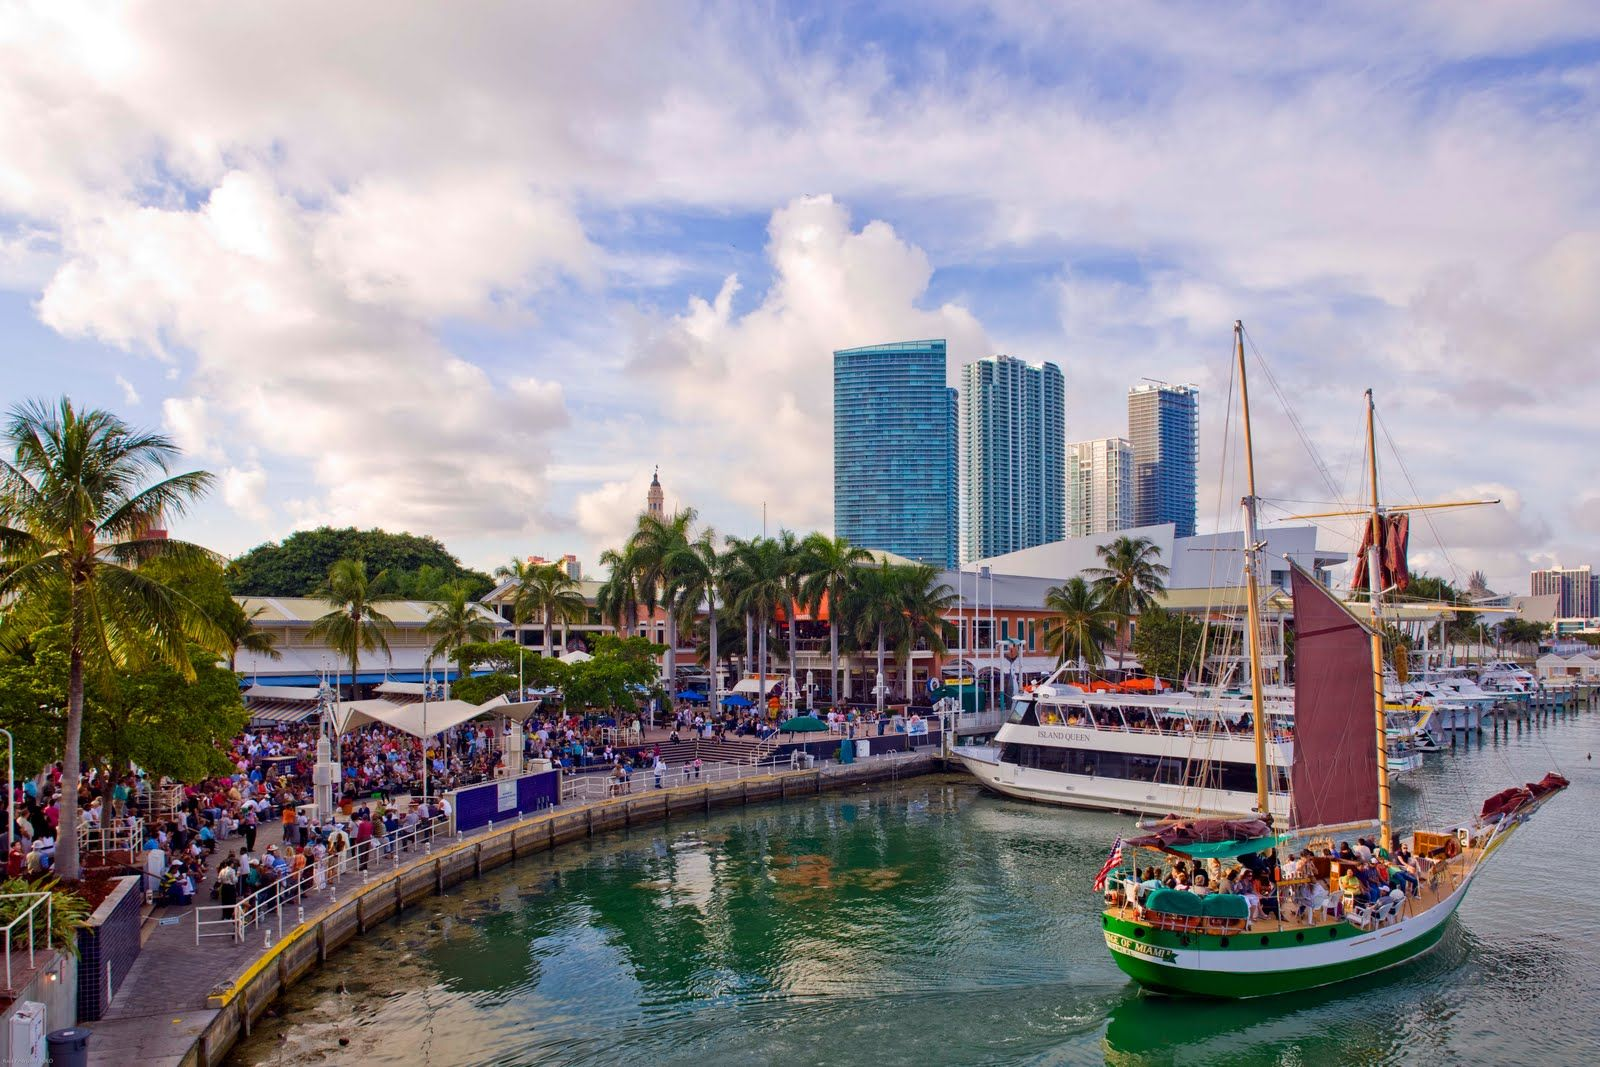 8876ff73d433fb32c088a5f0ce8369e3 - Donna's Caribbean Restaurant Miami Gardens Fl